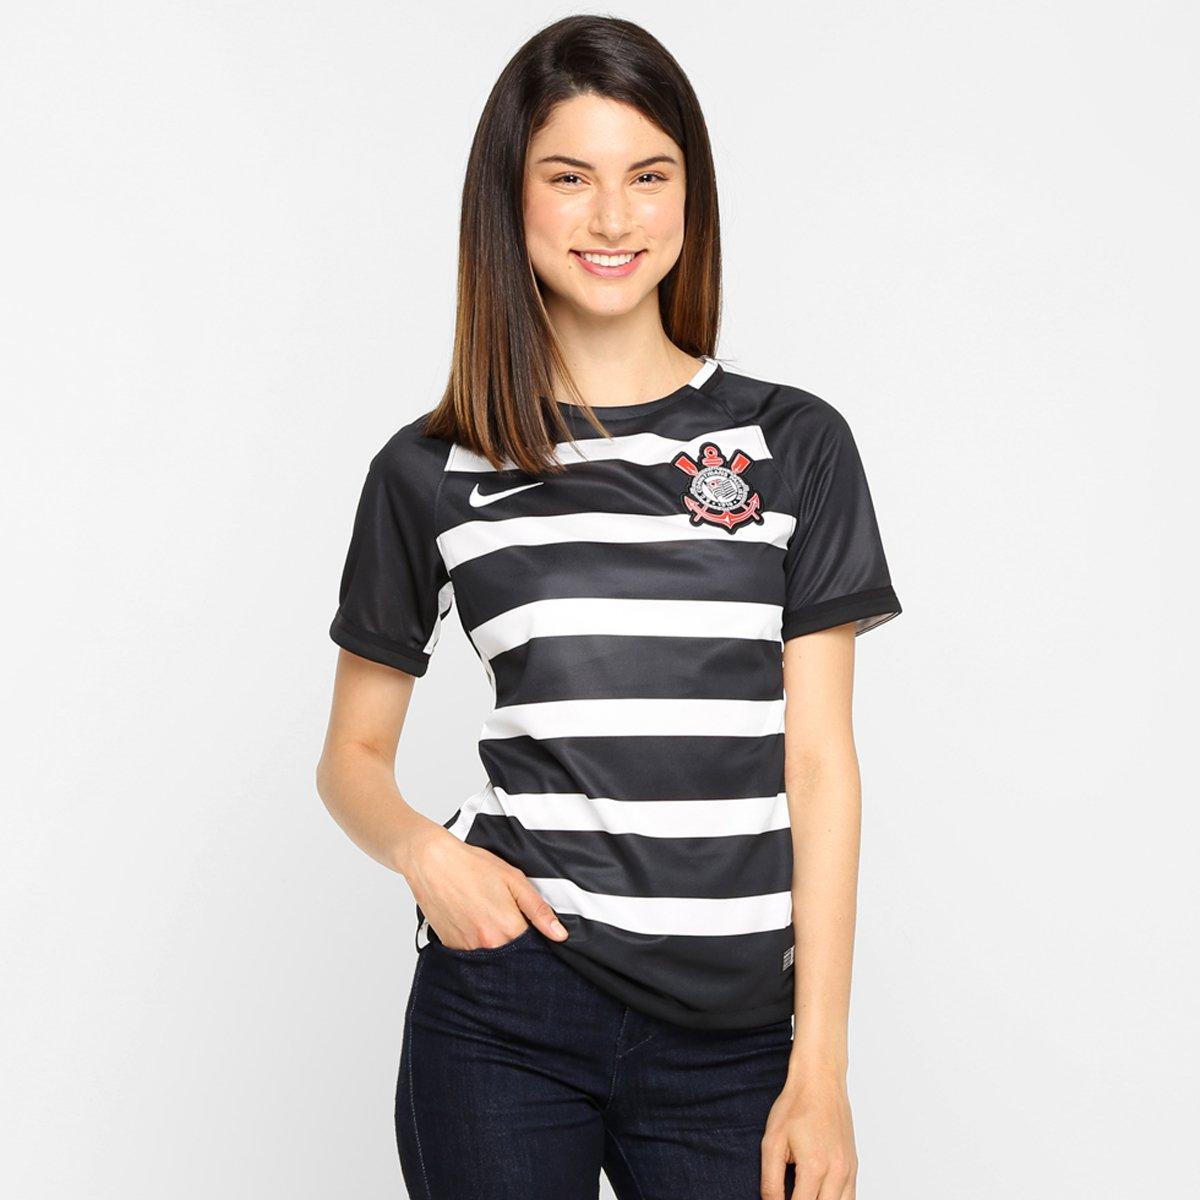 Camisa Feminina Nike Corinthians II 15 16 s nº - Compre Agora  16f7ffa16d58b